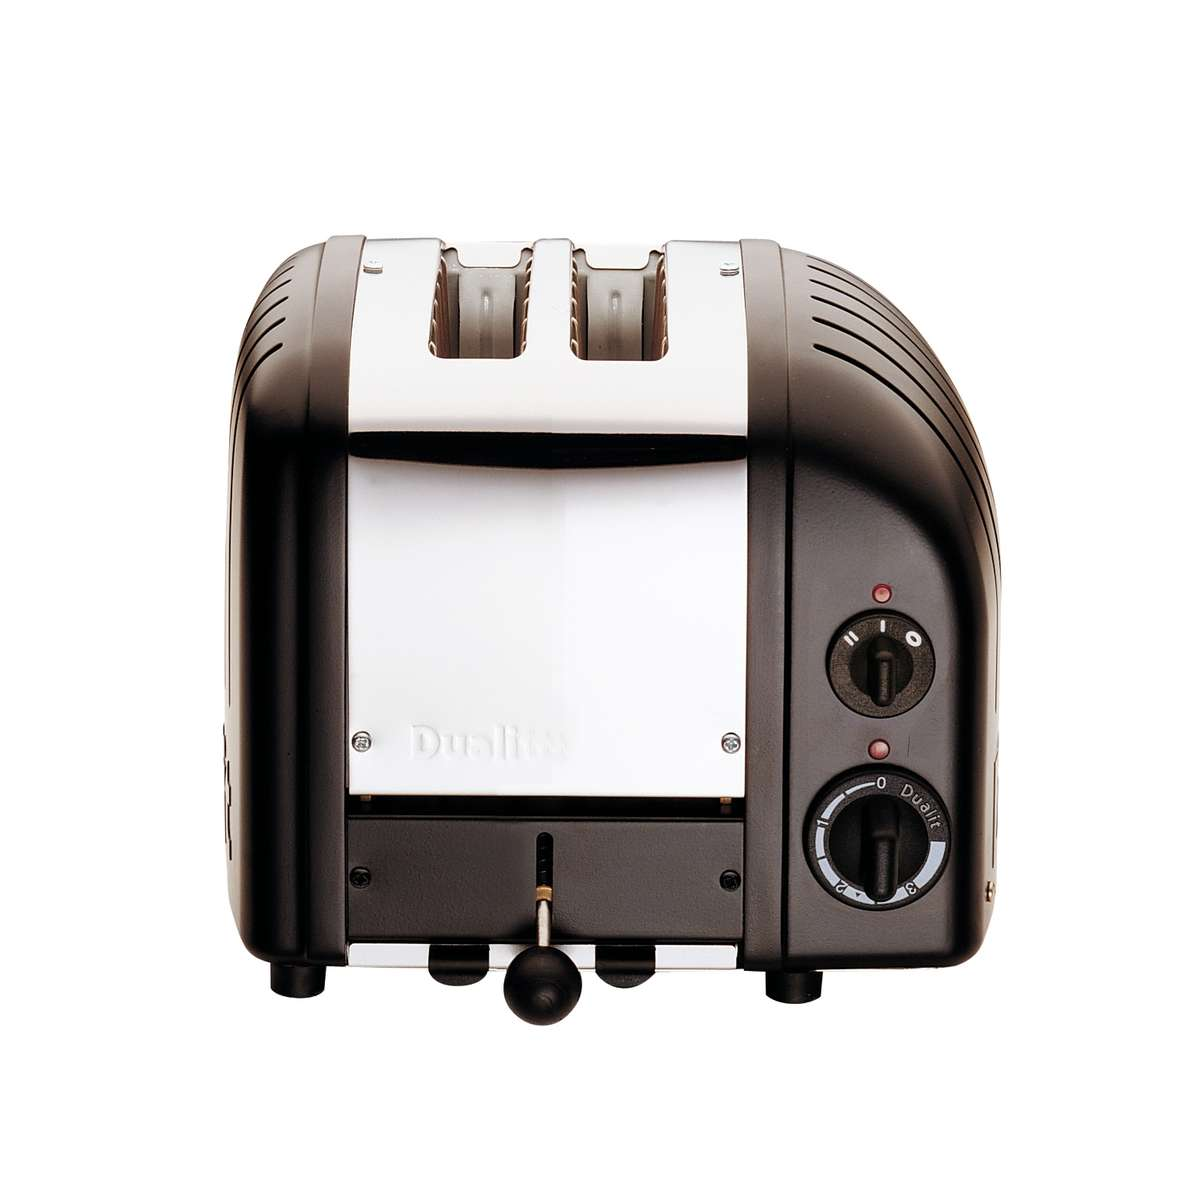 Dalit classic toaster